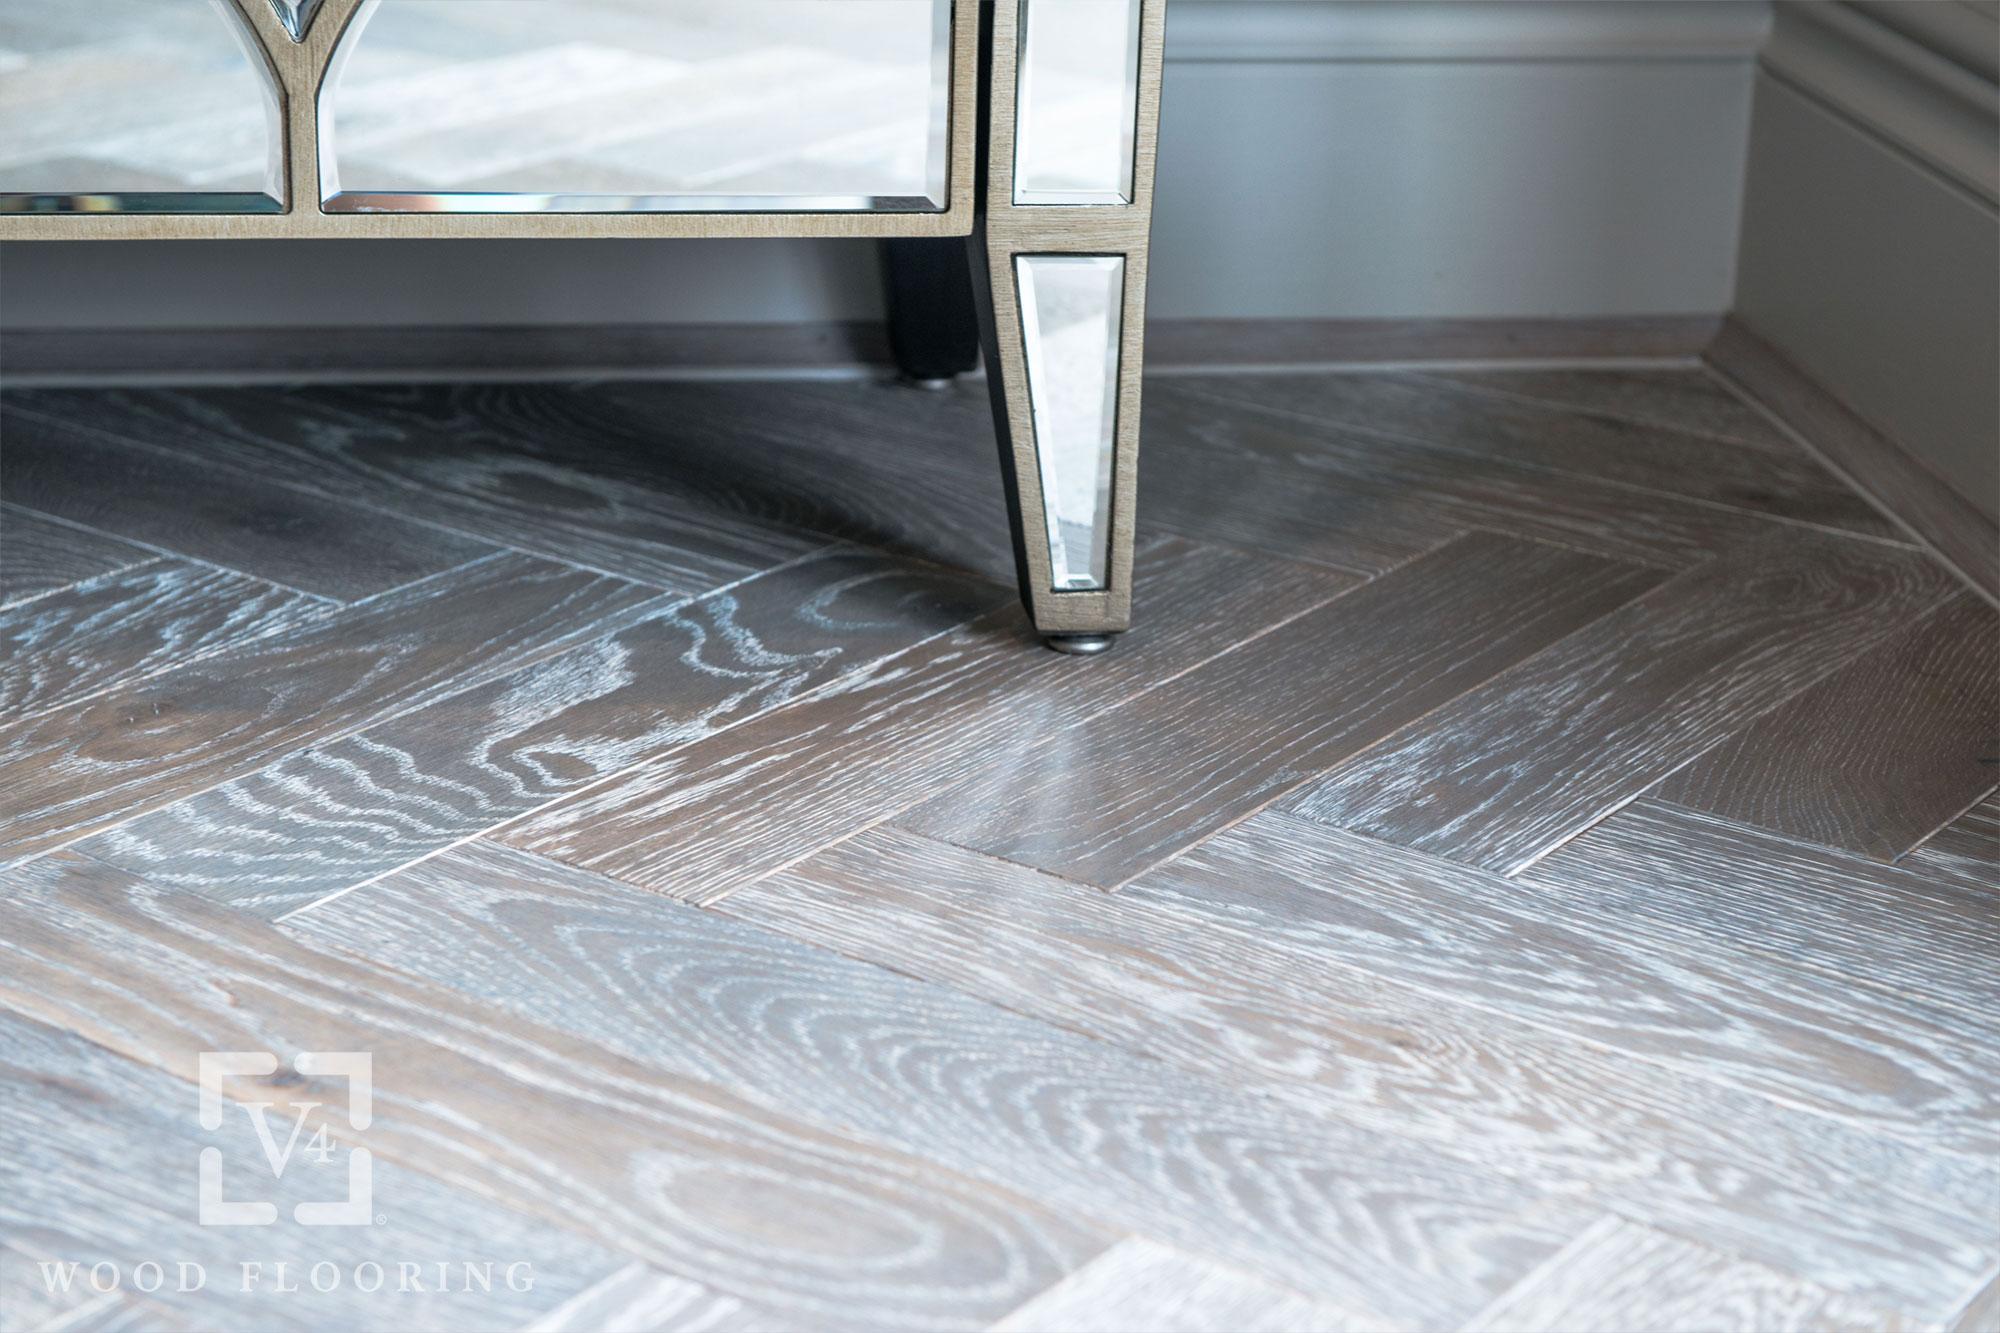 V4 Wood Flooring Zigzag Zb103 Spacers Showrooms